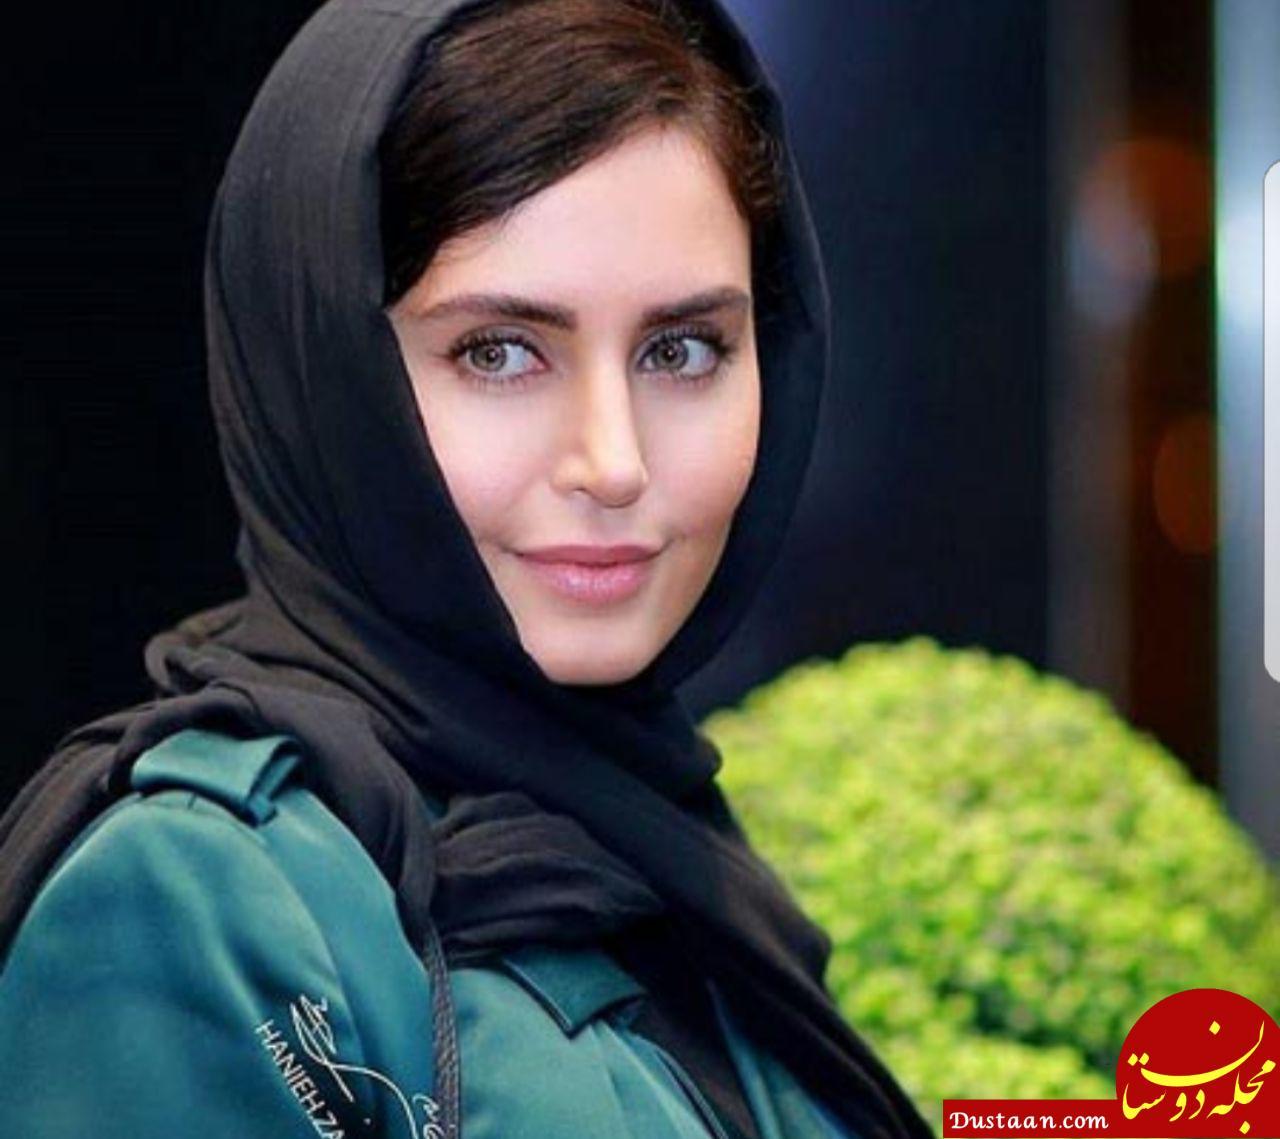 www.dustaan.com الناز شاکردوست به بیمارستان منتقل شد +عکس